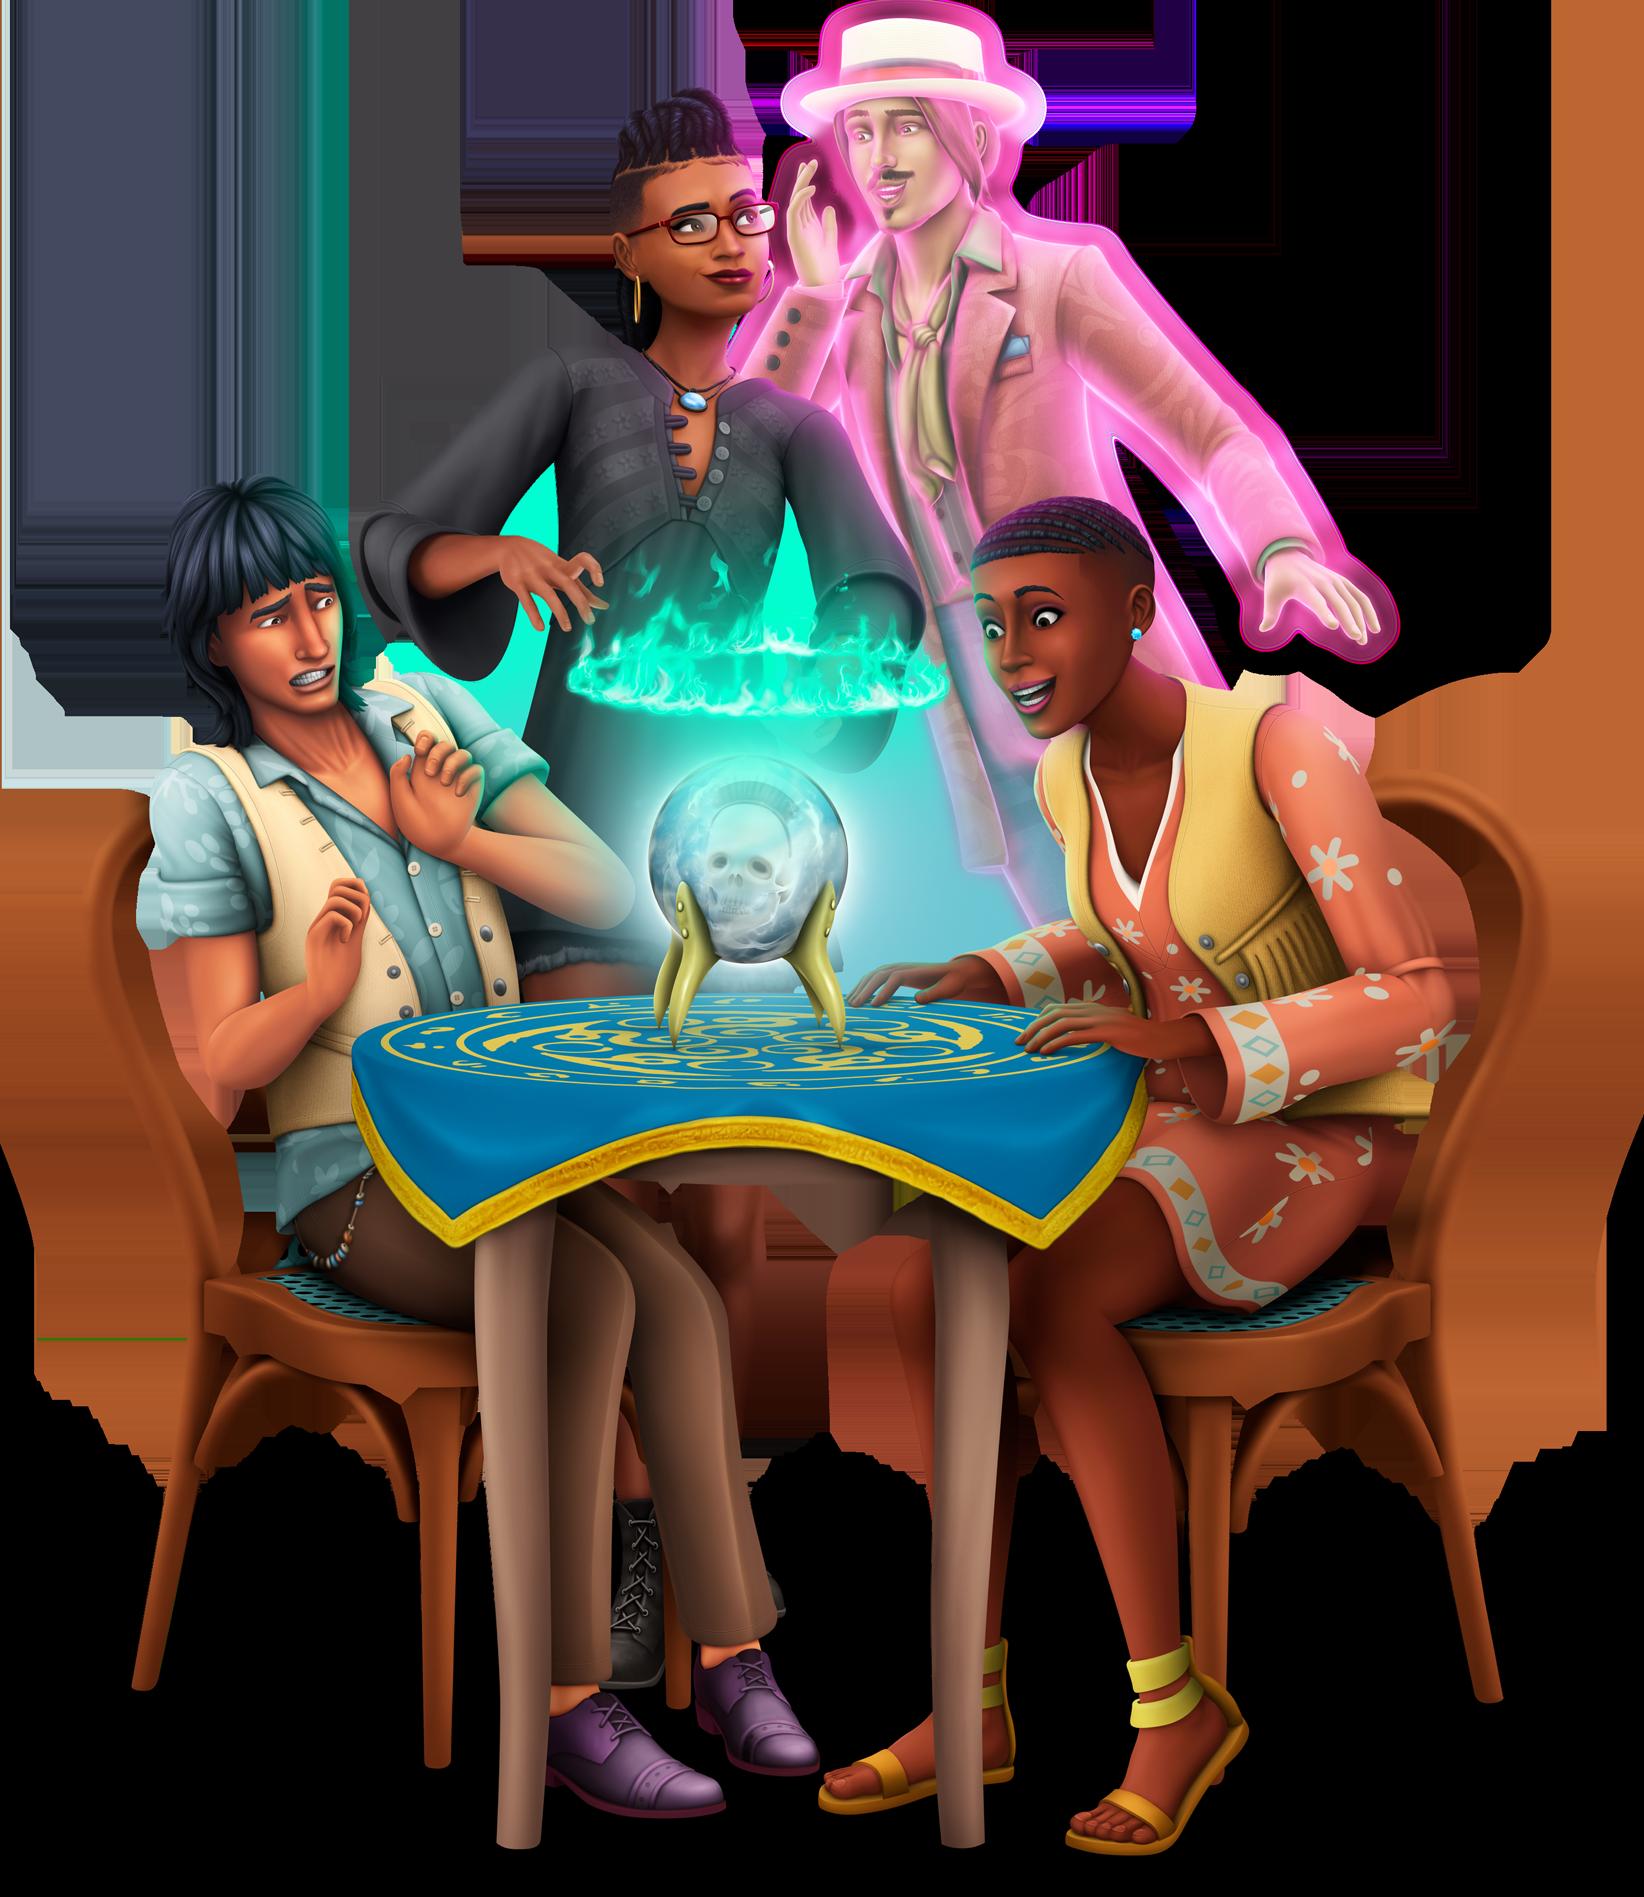 The-Sims-4-Paranormal-Stuff-Pack-License-Serial-Keys